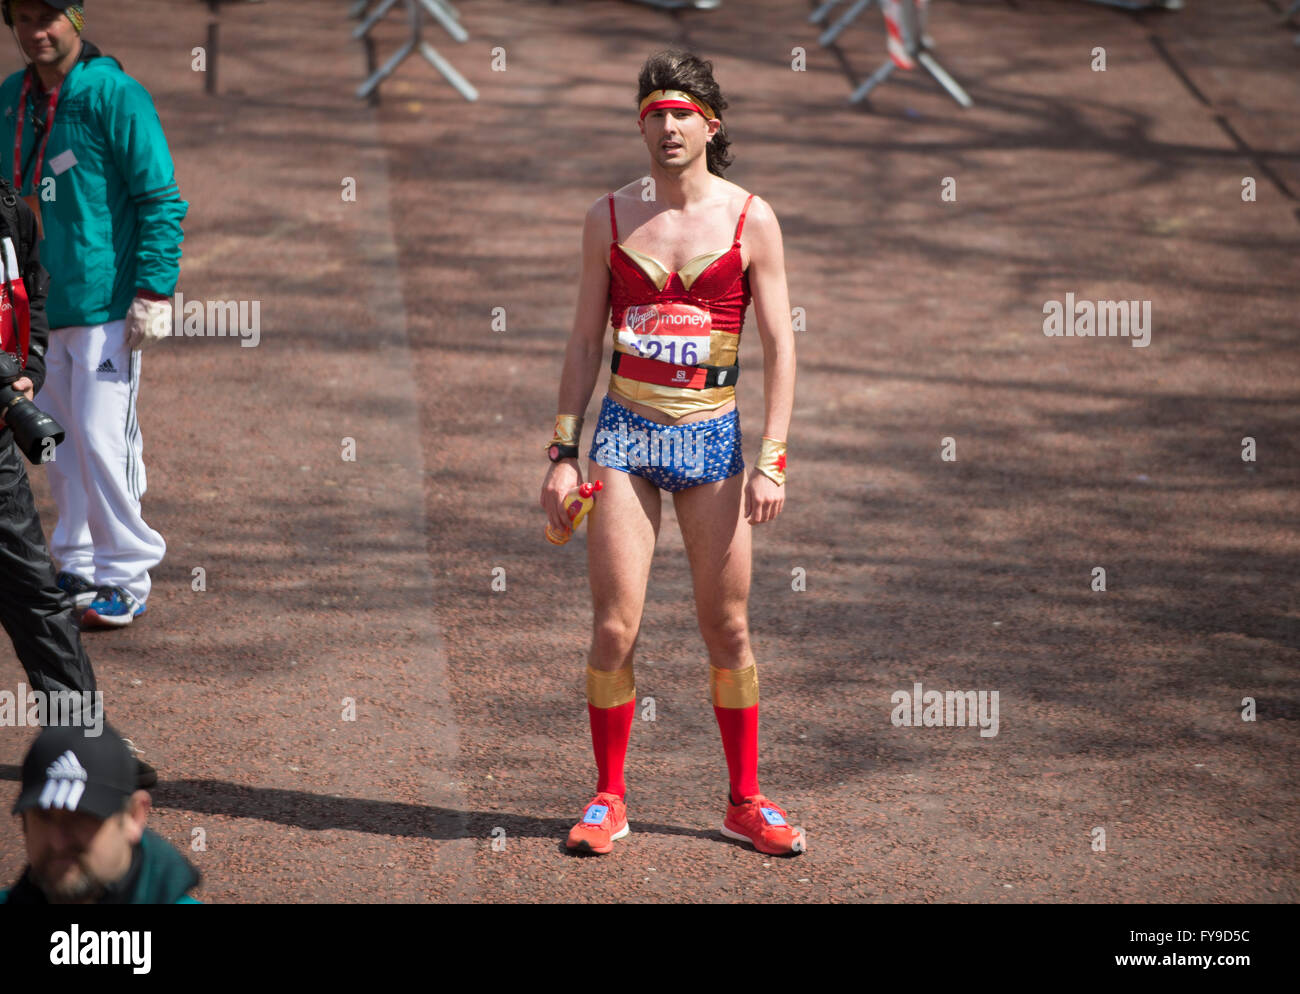 The Mall, London, UK. 24th April, 2016. 2016 Virgin London Marathon, Wonder Woman lookalike crosses the finish line. Credit:  sportsimages/Alamy Live News Stock Photo